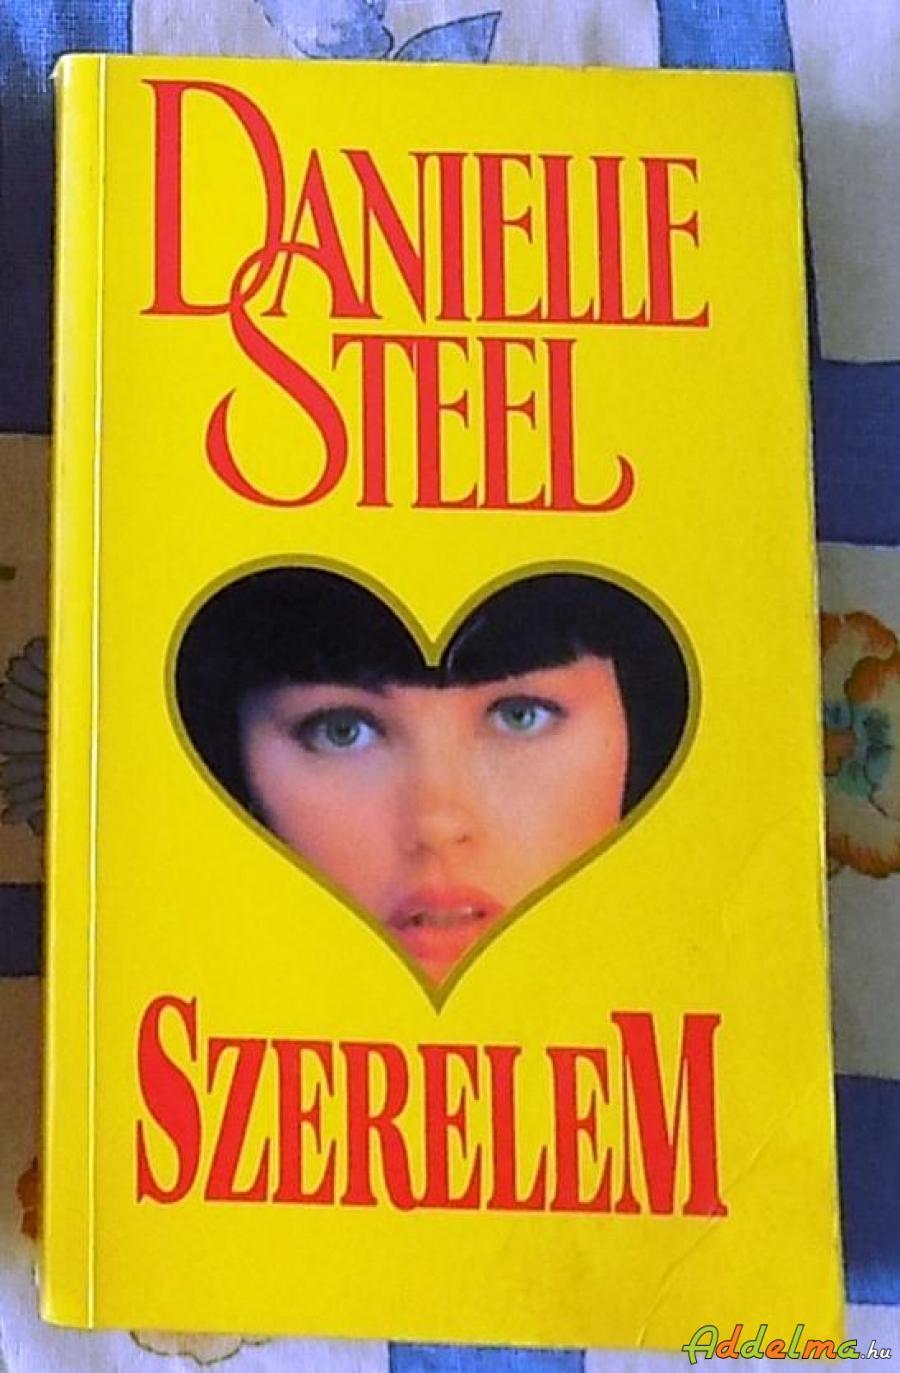 Danielle Steel: Szerelem